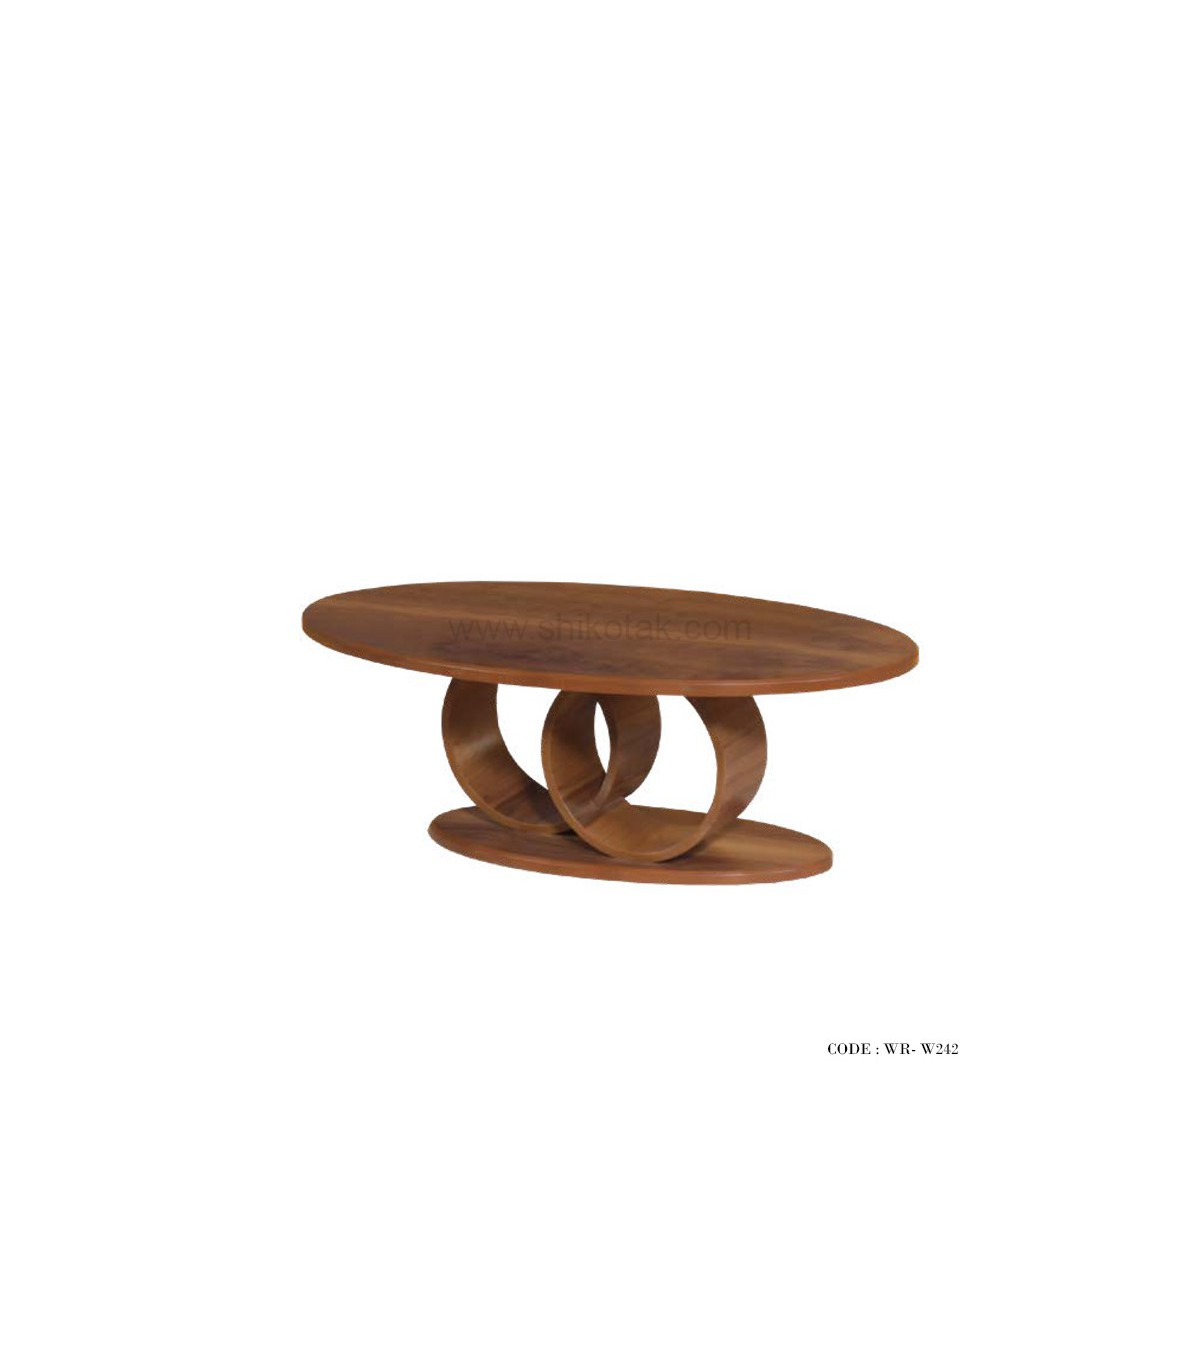 میز پایه دایره ای